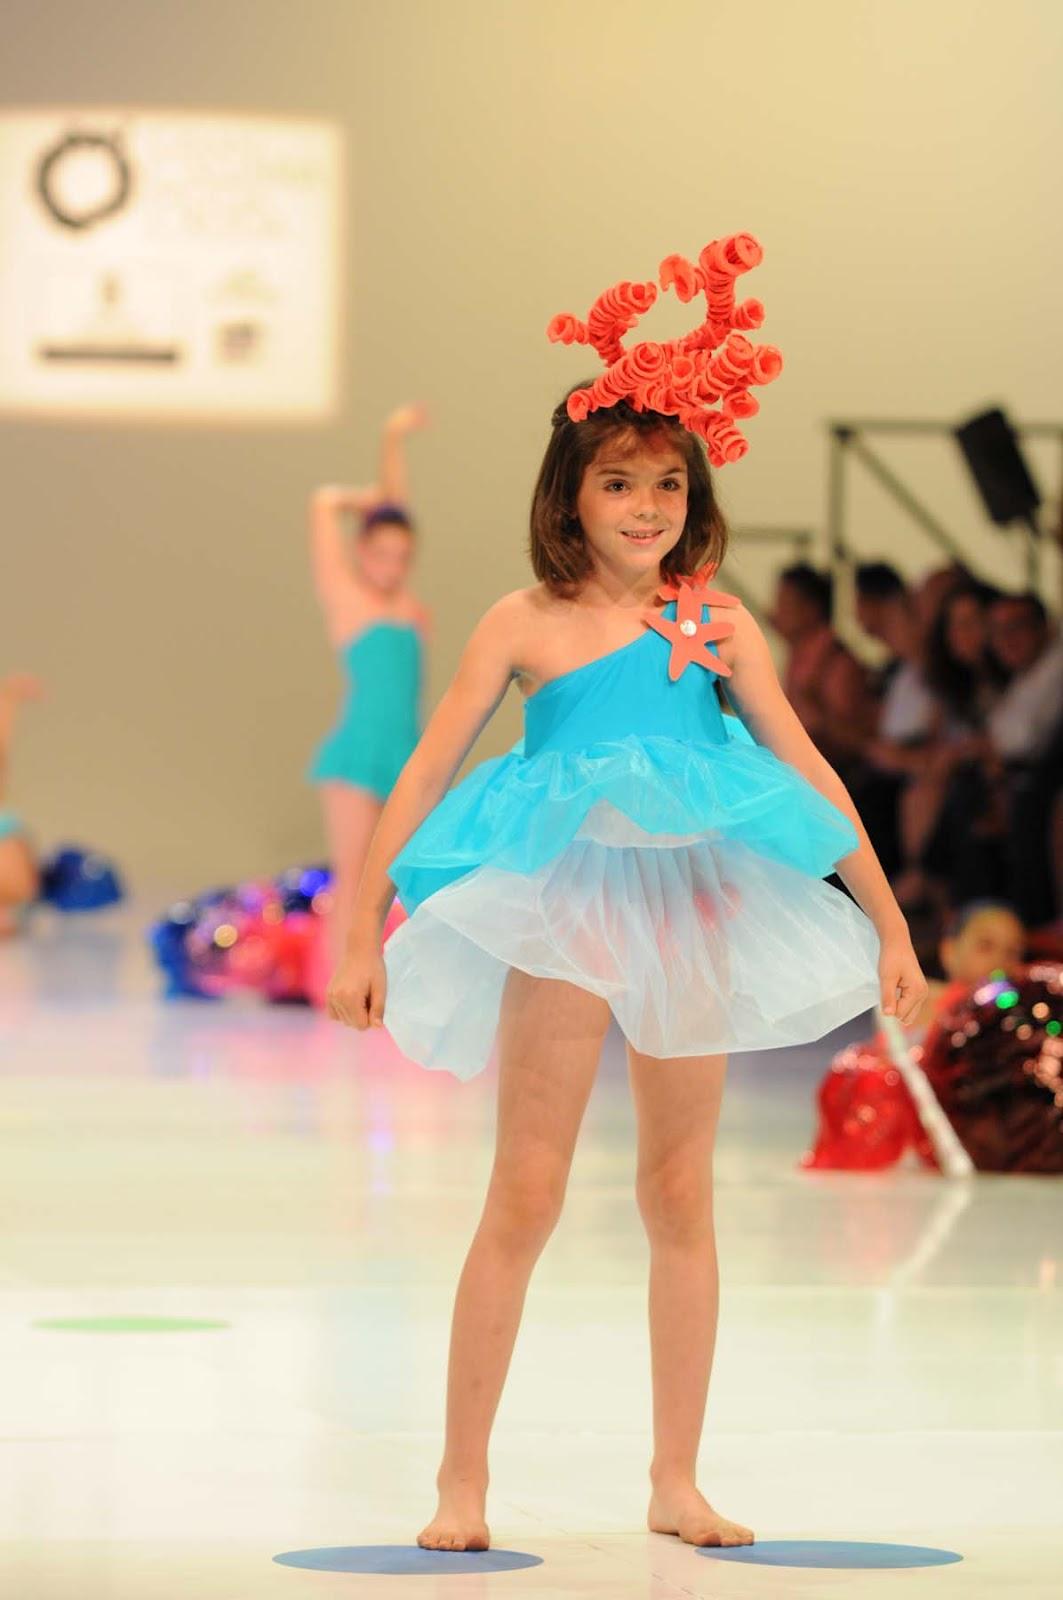 Fotos arranc gran canaria moda c lida con desfile infantil de ba o - Gran canaria tv com ...